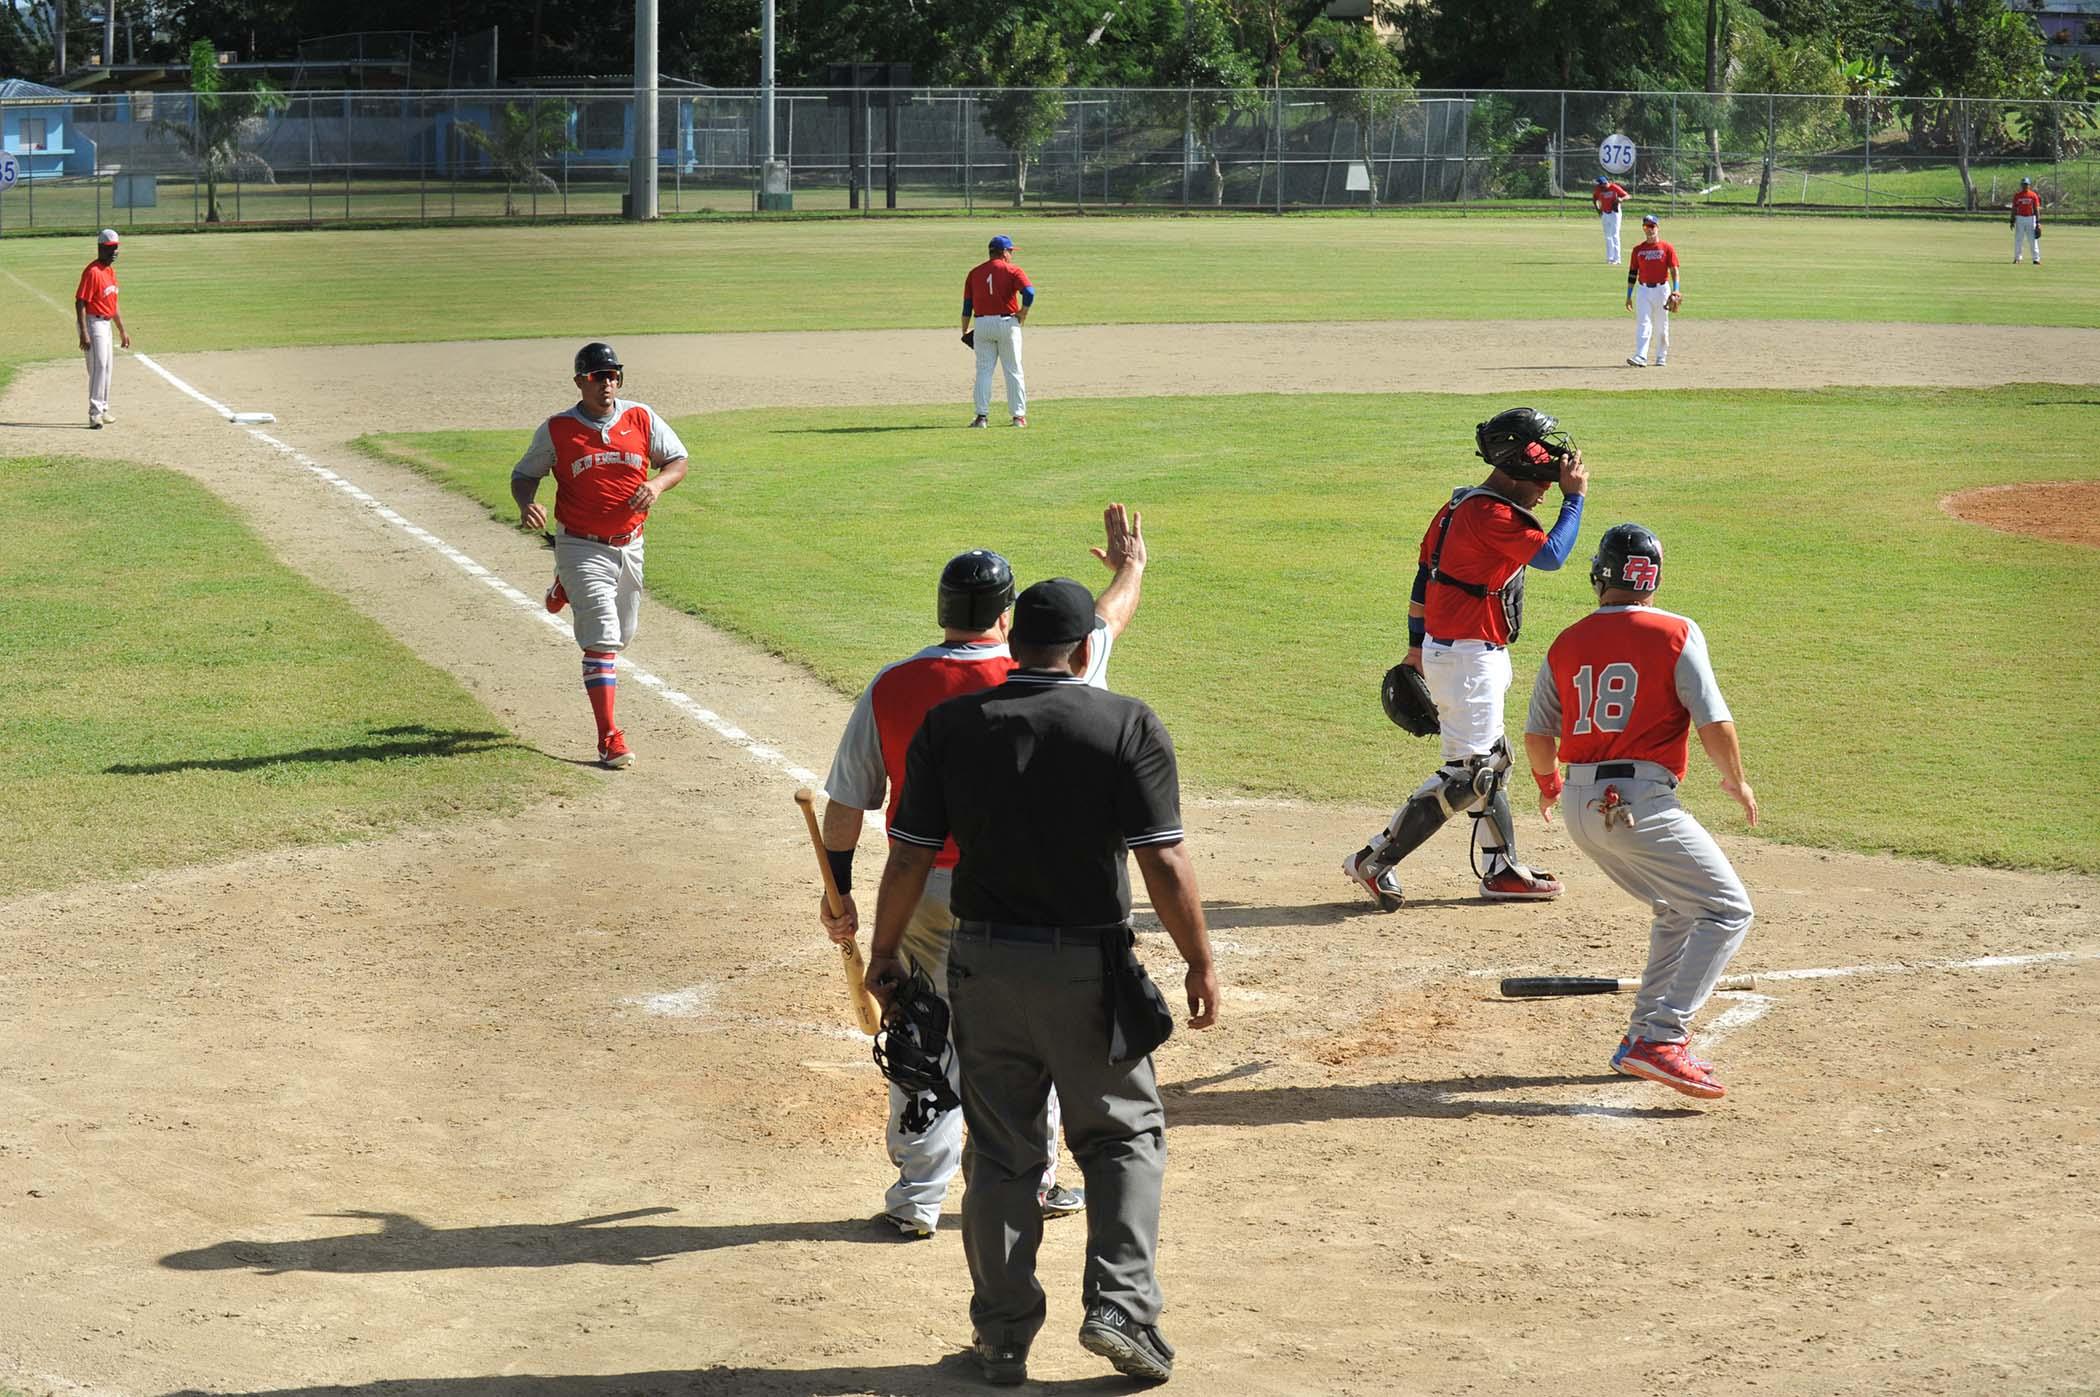 Partido de Baseball entre PR vs New England